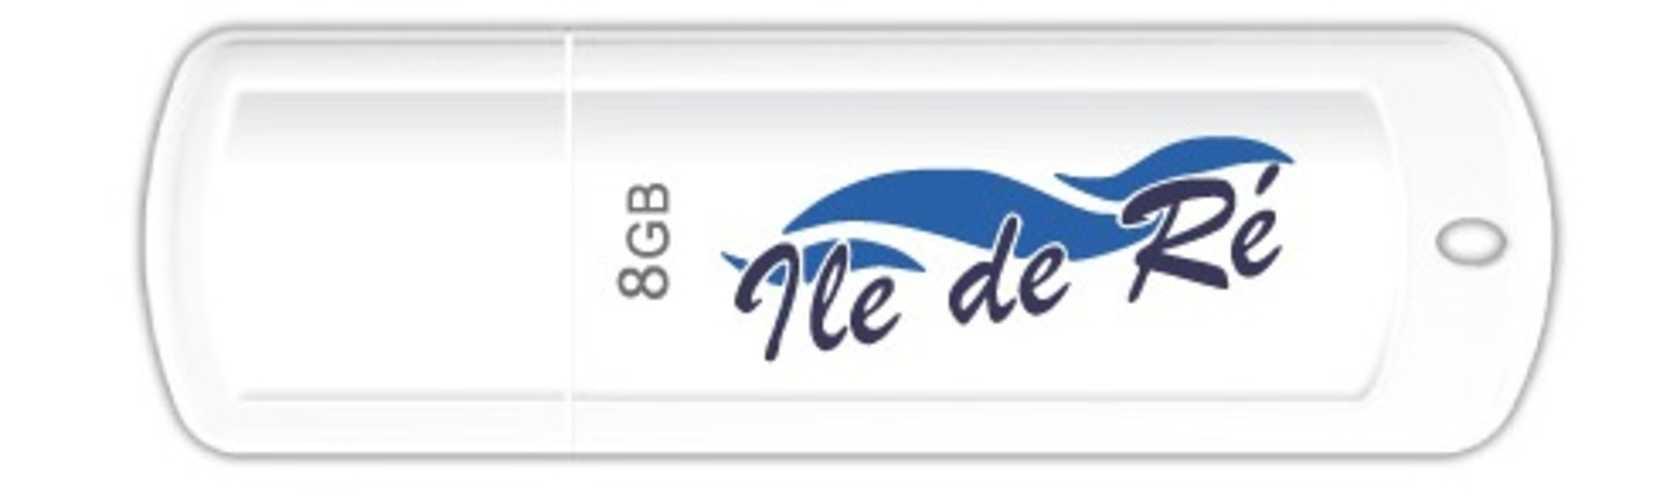 CLE USB 8 GO SERIE 370 BLANC GLOSSY USB 2.0 LOGO ILE DE RE 0